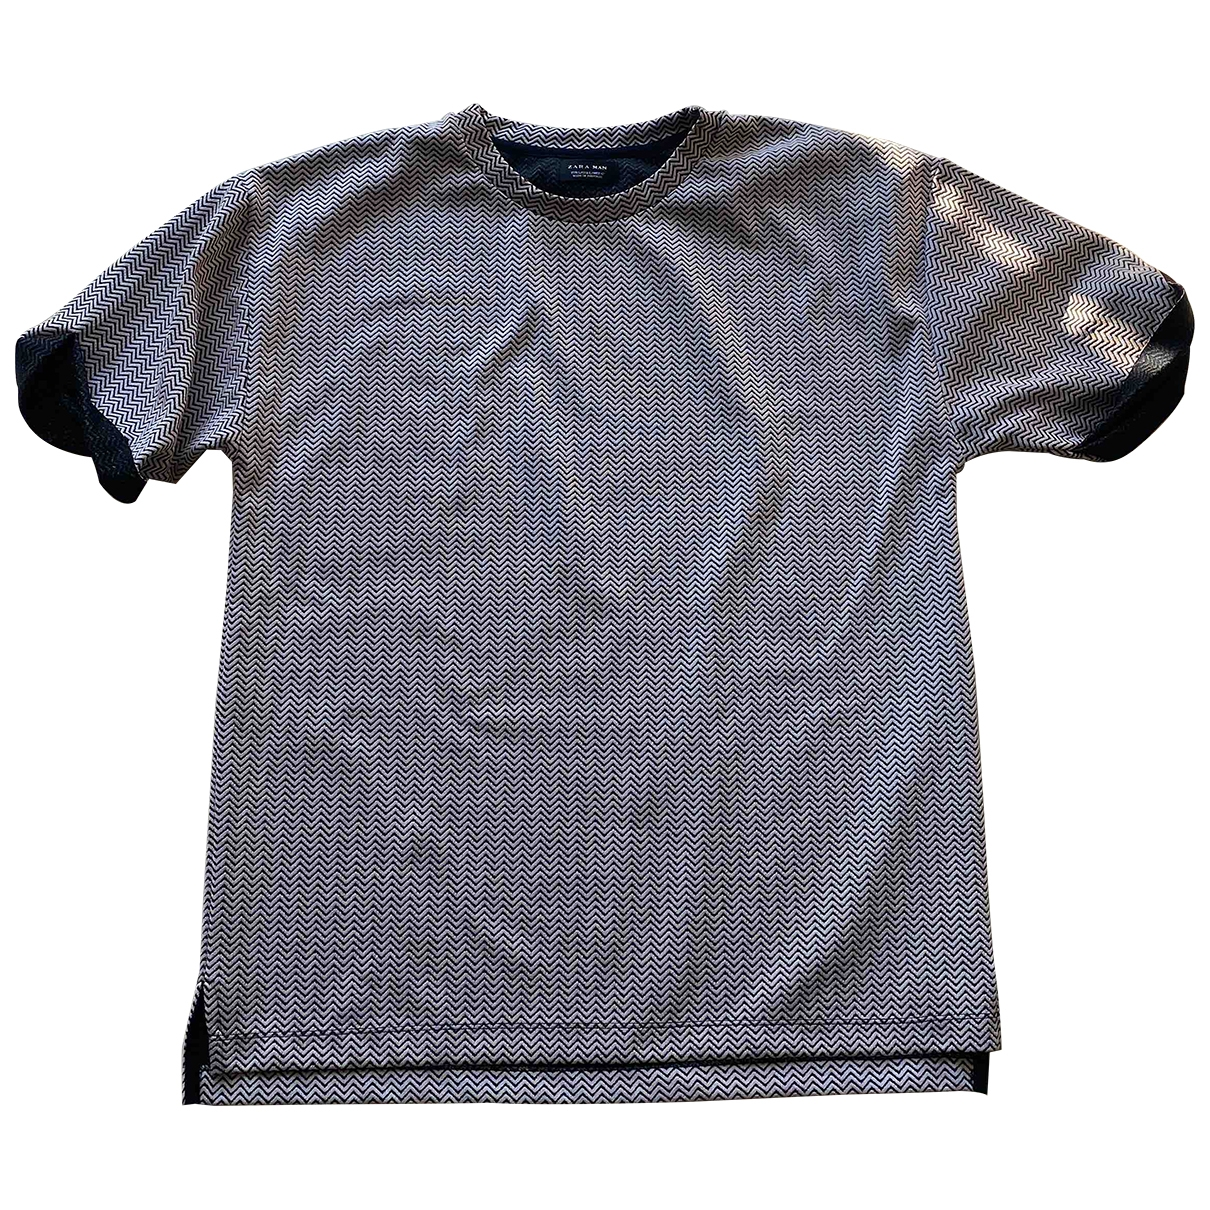 Zara \N T-shirts for Men L International